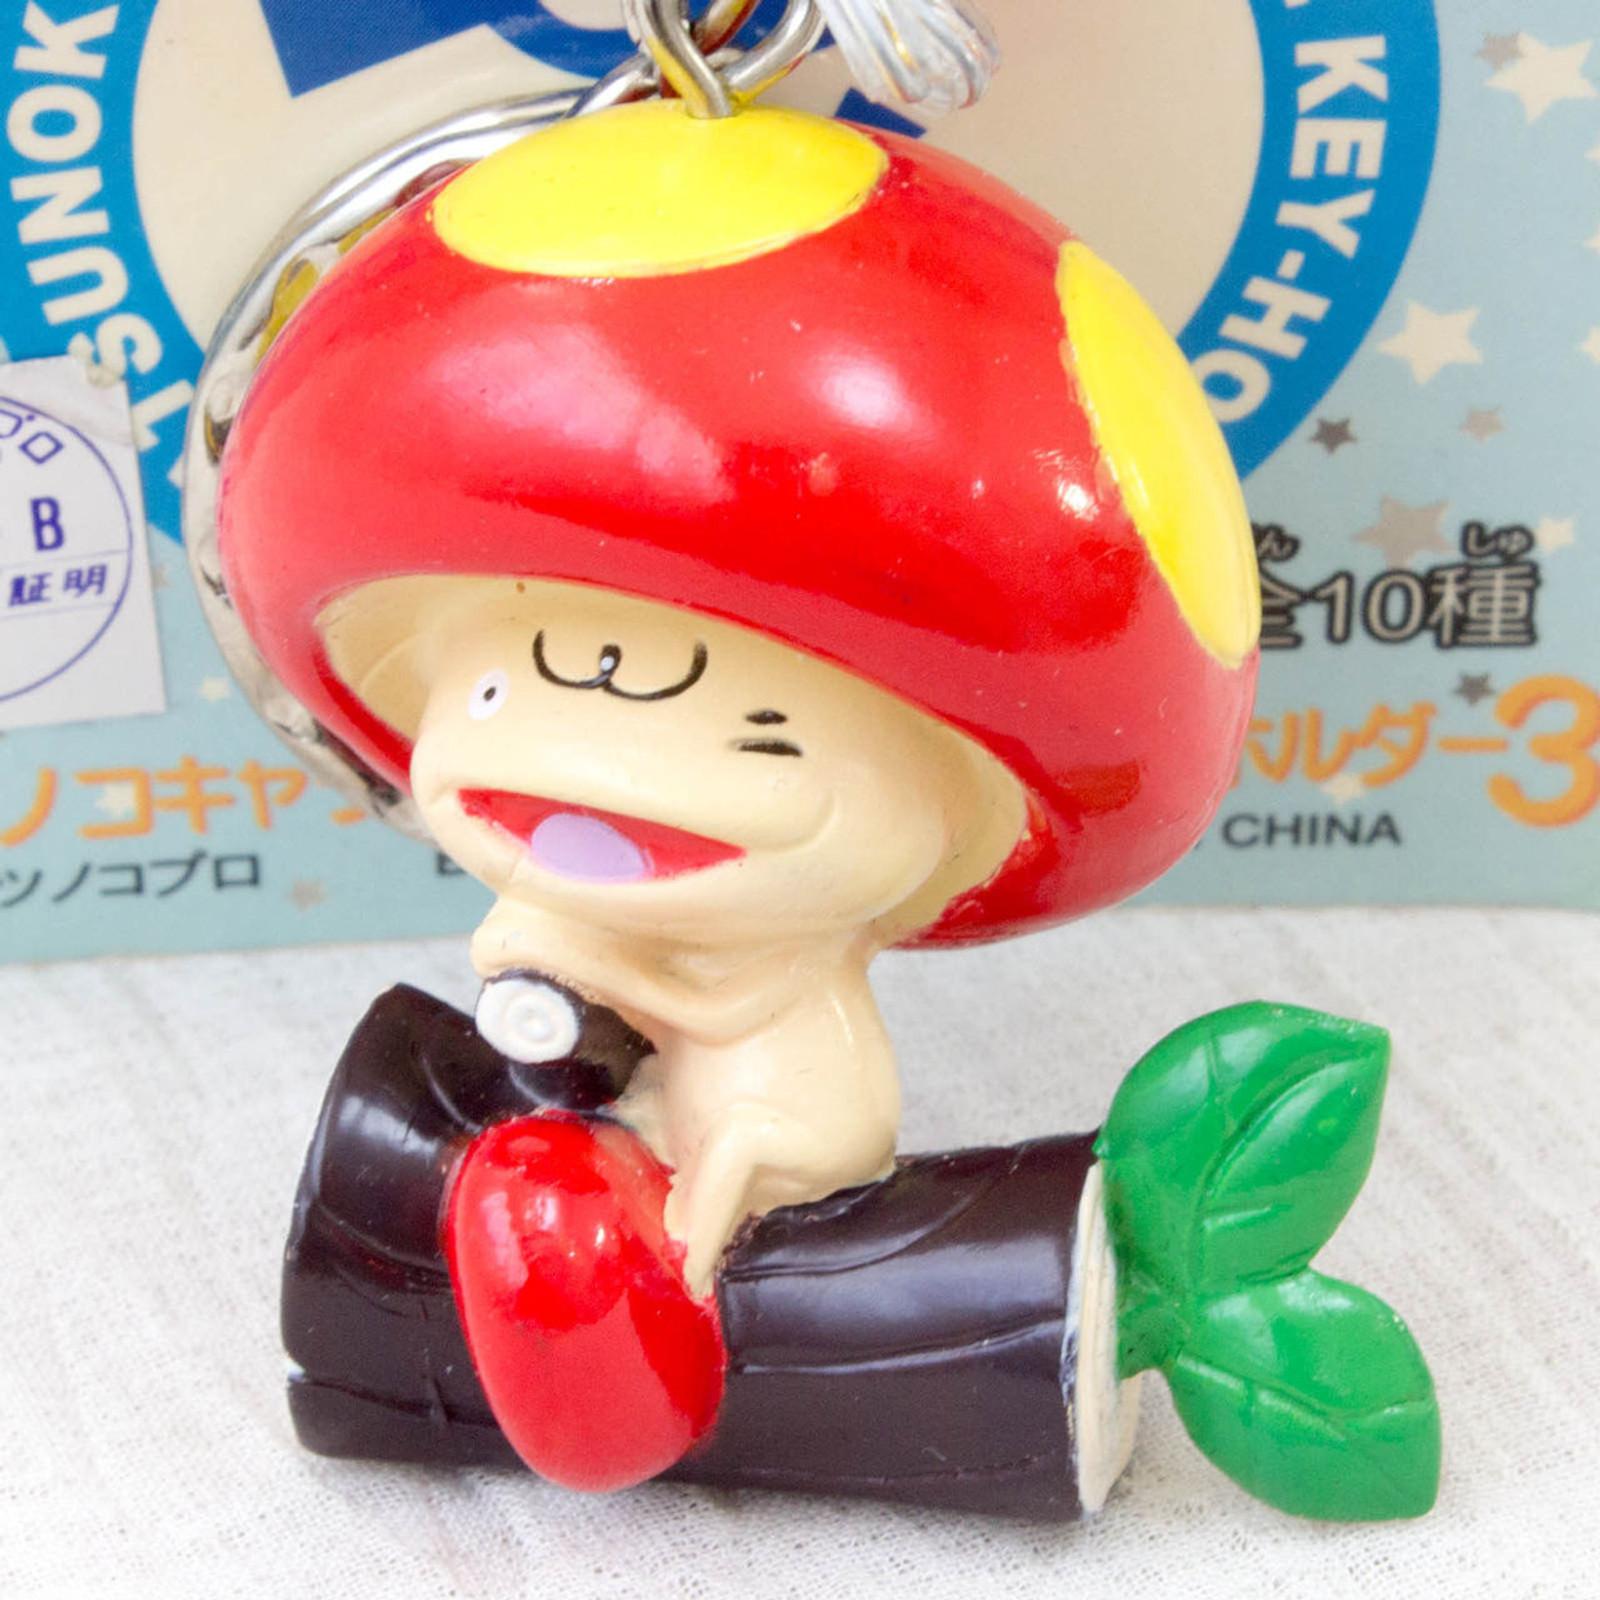 Paul's Miraculous Adventure Chinoppi Figure Key Chain Tatsunoko Pro JAPAN ANIME